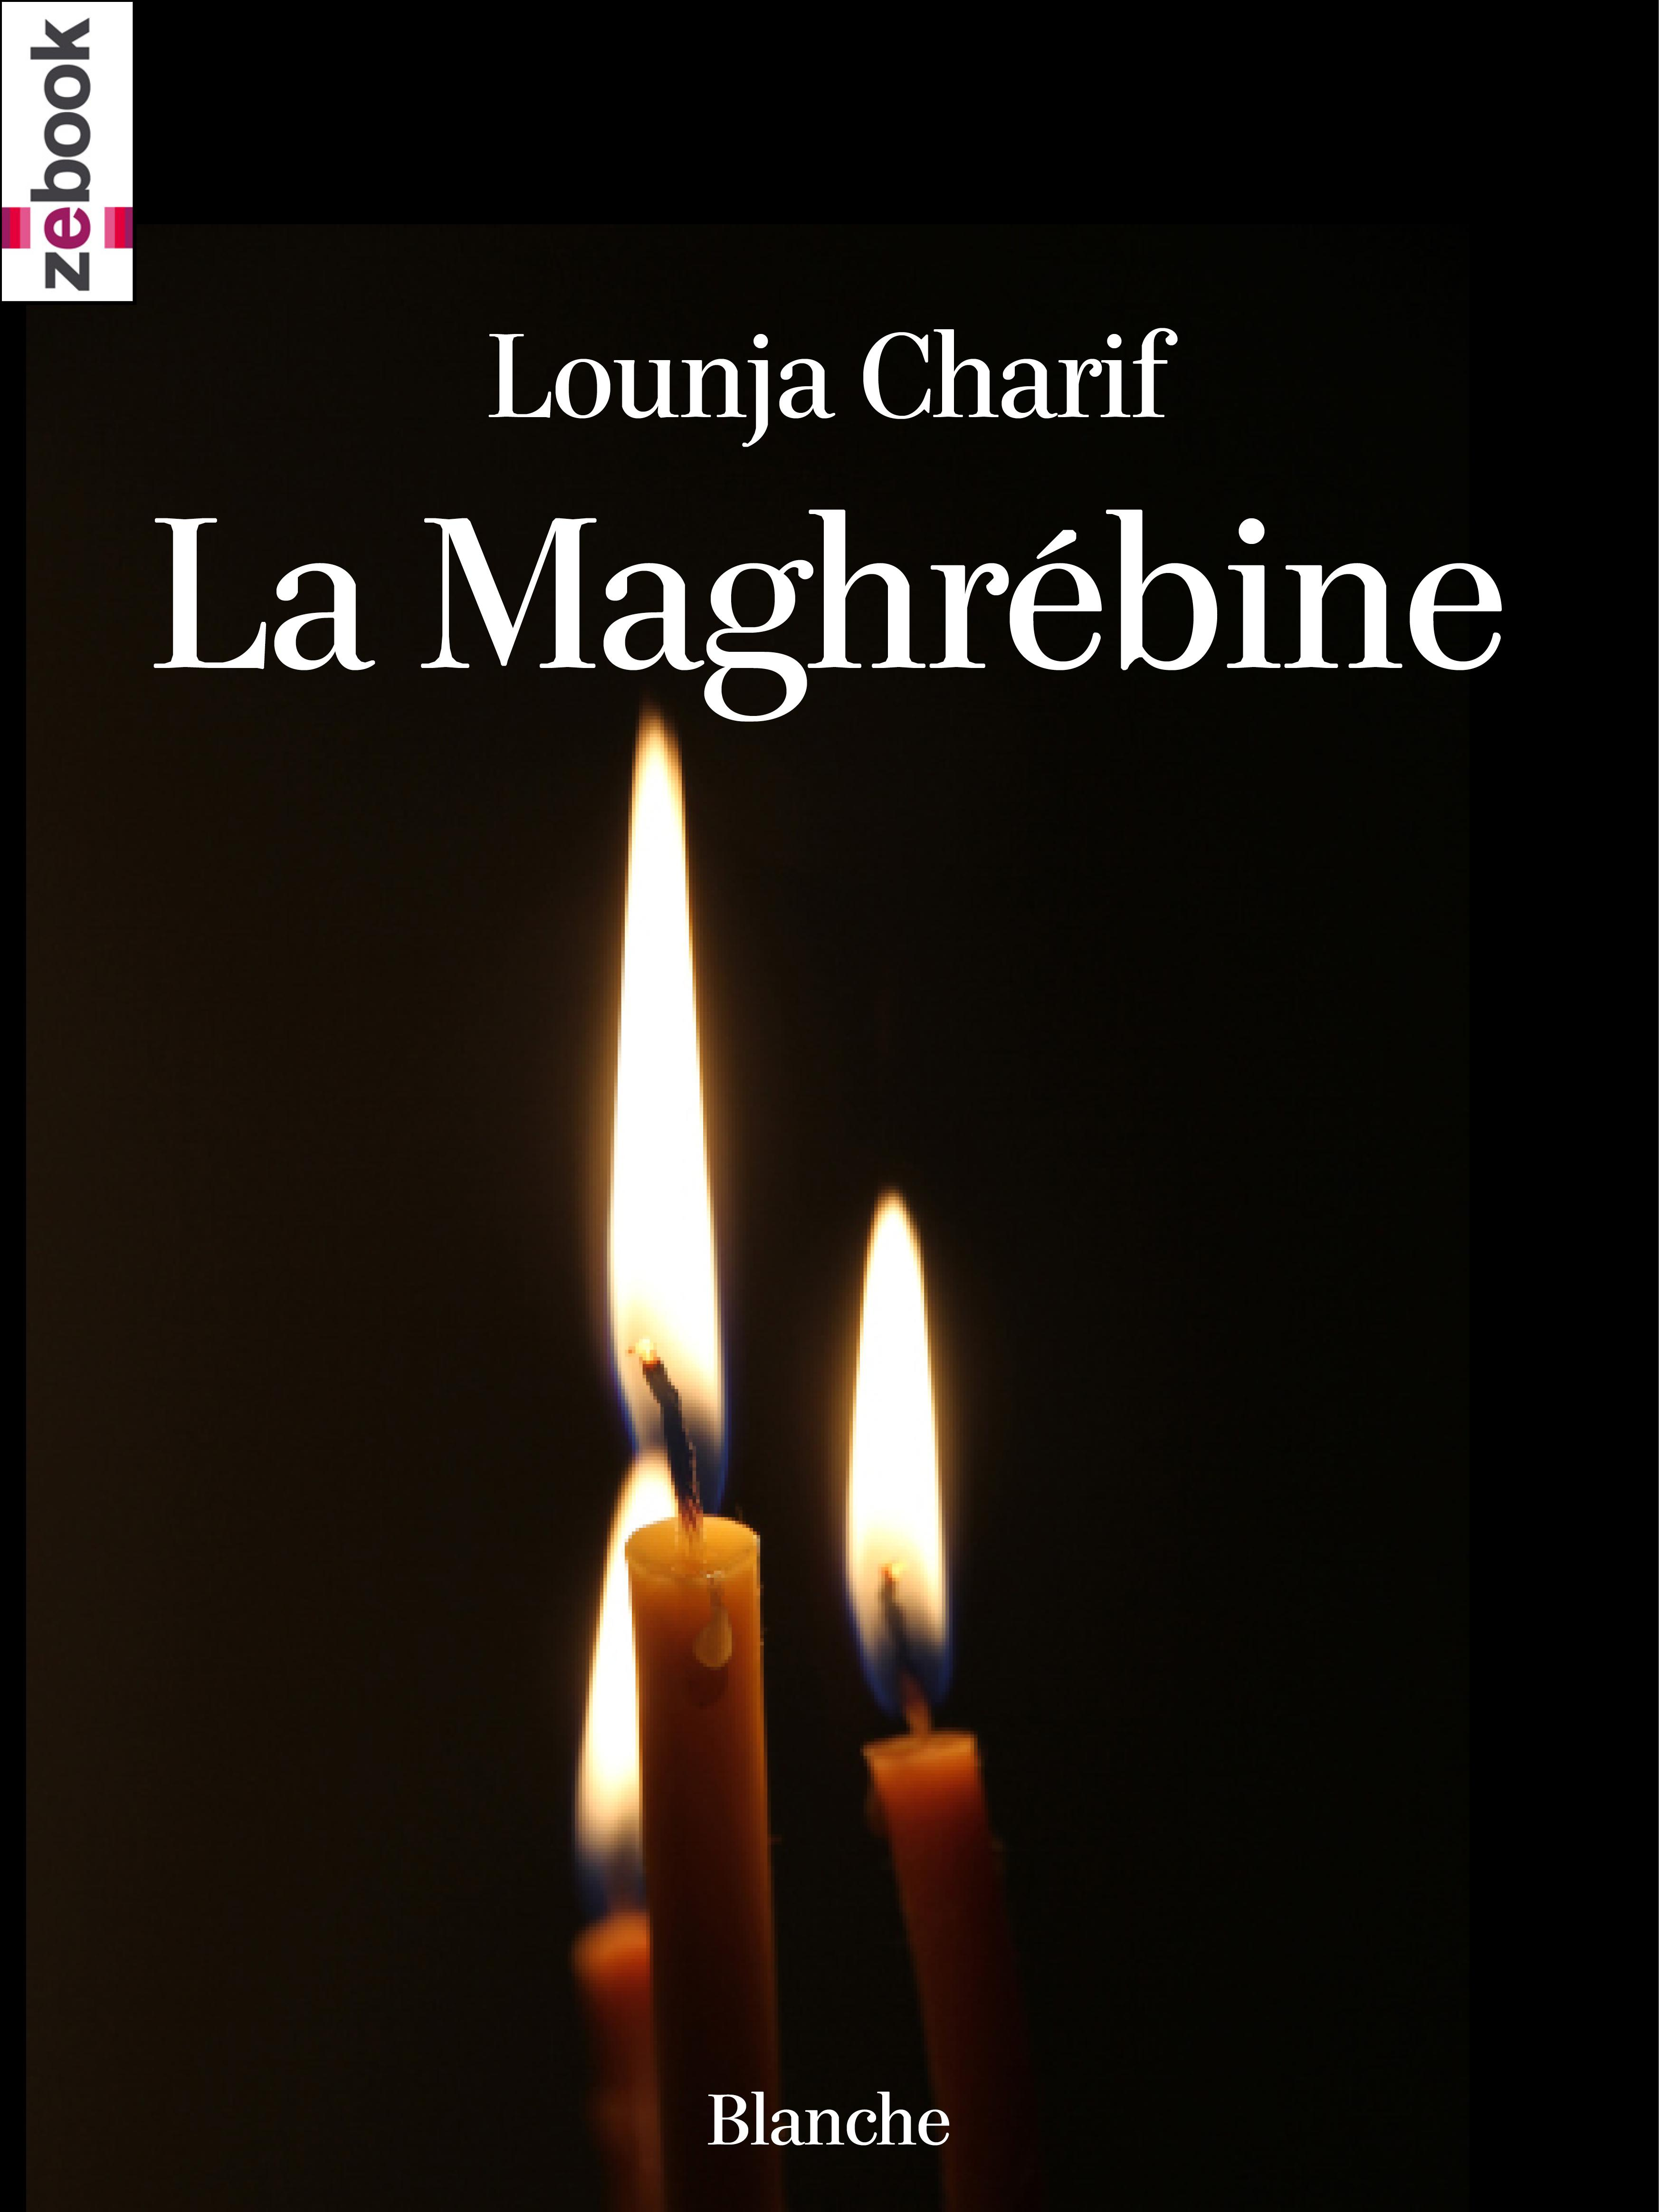 La Maghrébine